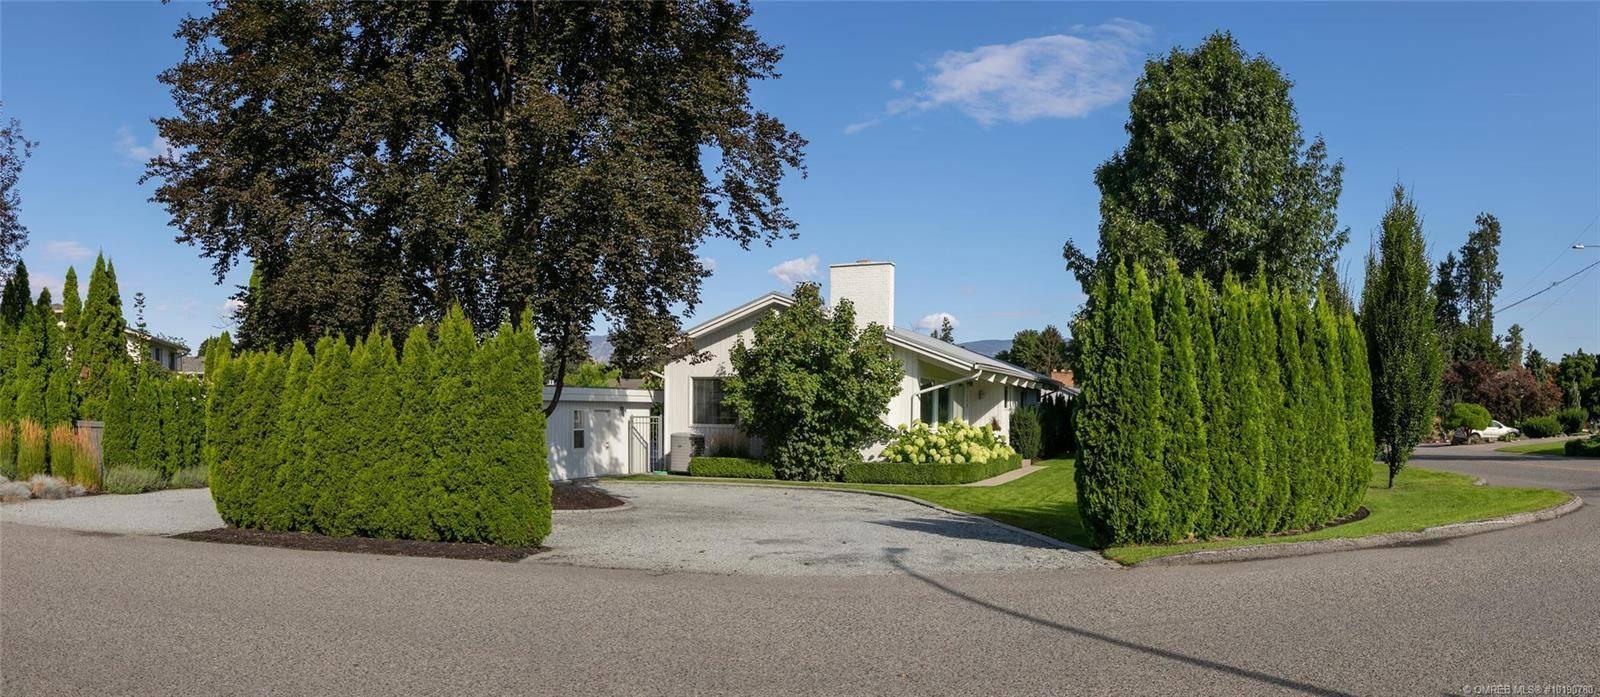 House for sale at 499 Sarsons Rd Kelowna British Columbia - MLS: 10190780